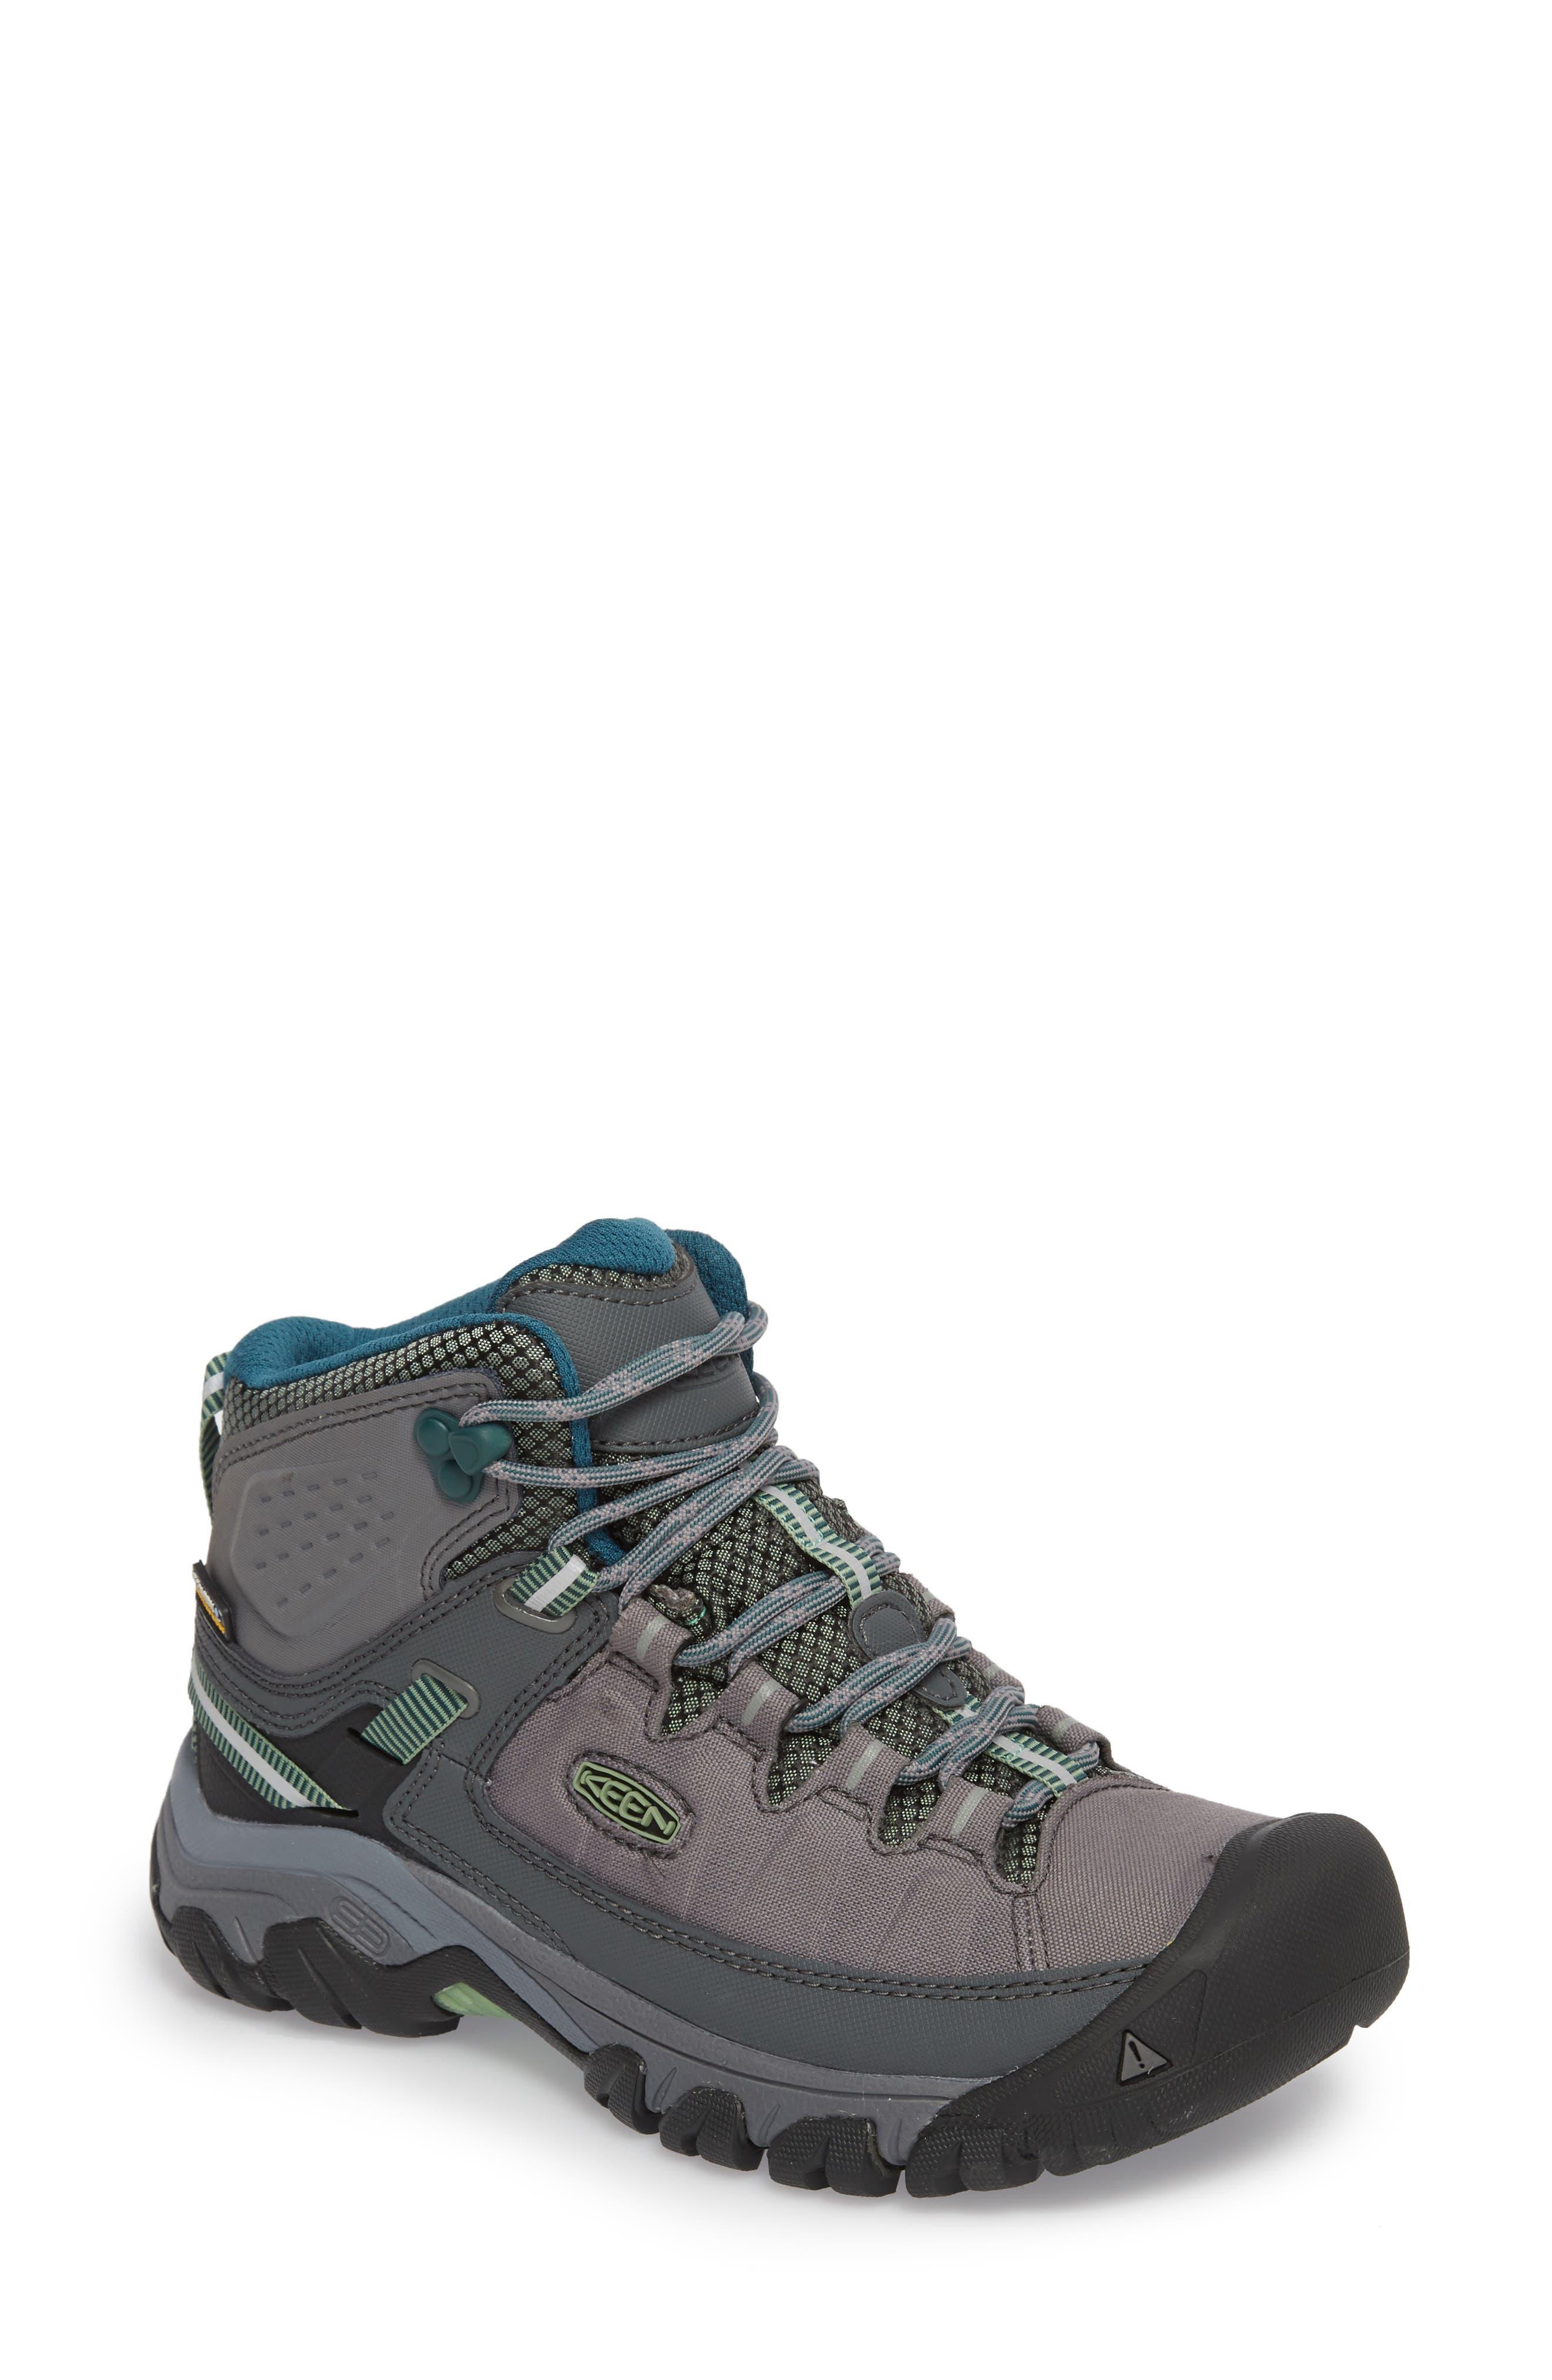 Targhee EXP Mid Waterproof Hiking Shoe,                             Main thumbnail 1, color,                             STEEL GREY/ BASIL